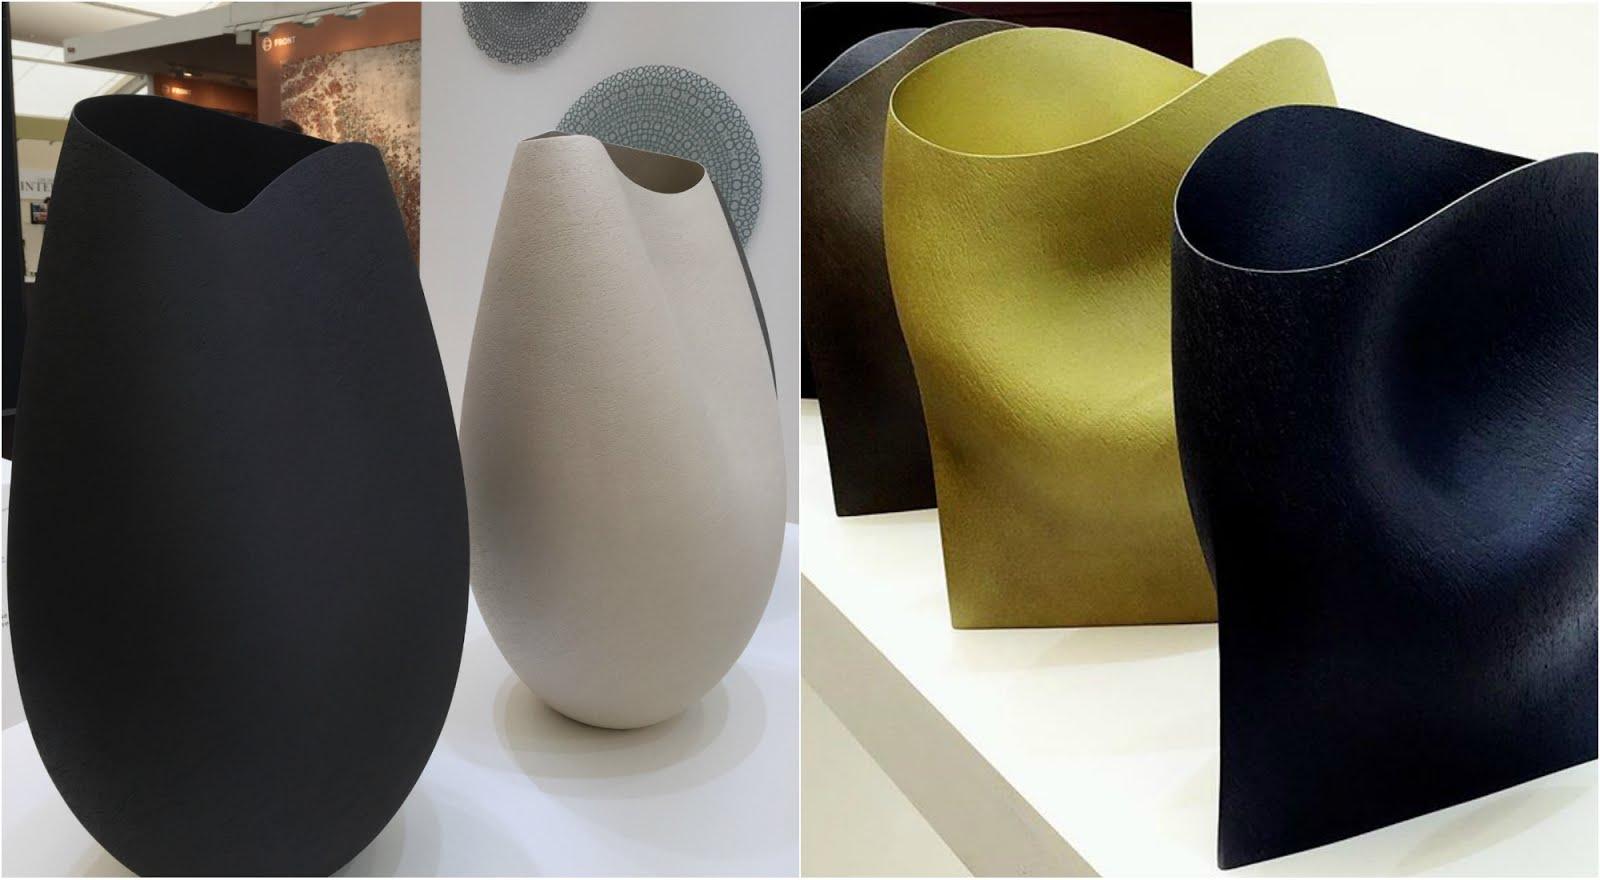 Decorex highlights, LDF, Interior design, interiors trends, hello peagreen, future heritage